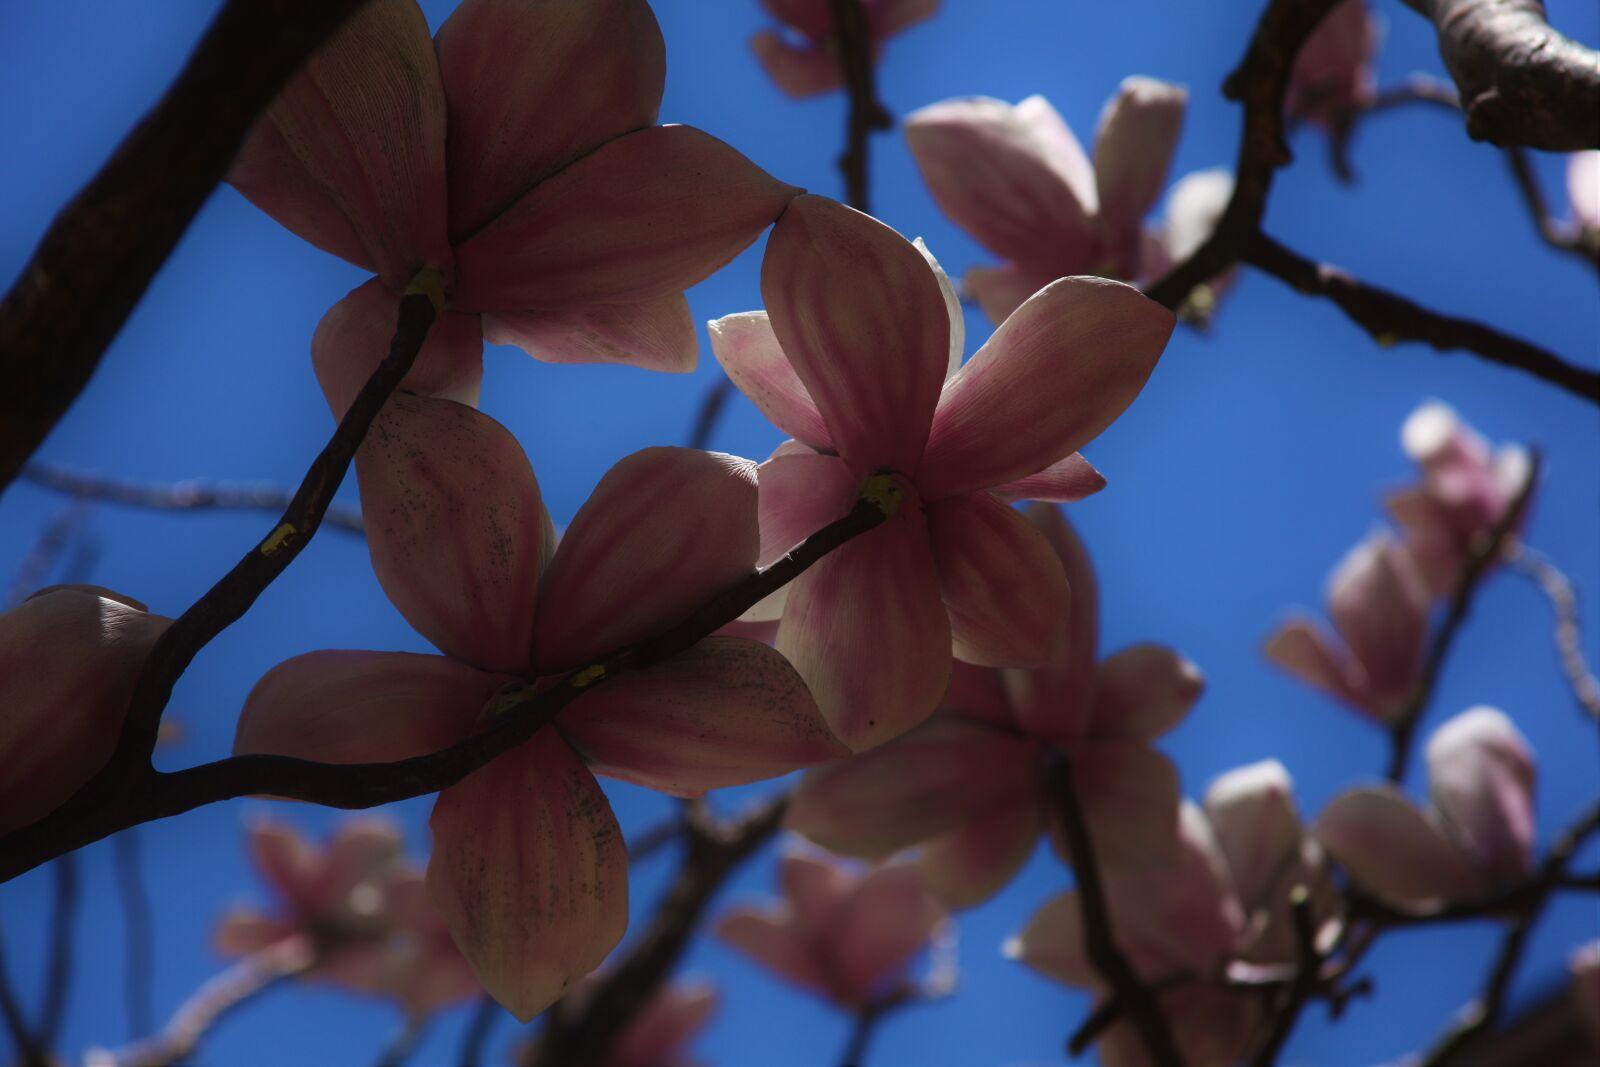 flowers, pink, sky, sunlight, Canon EOS 5D MARK II, Canon EF 28-135mm f/3.5-5.6 IS